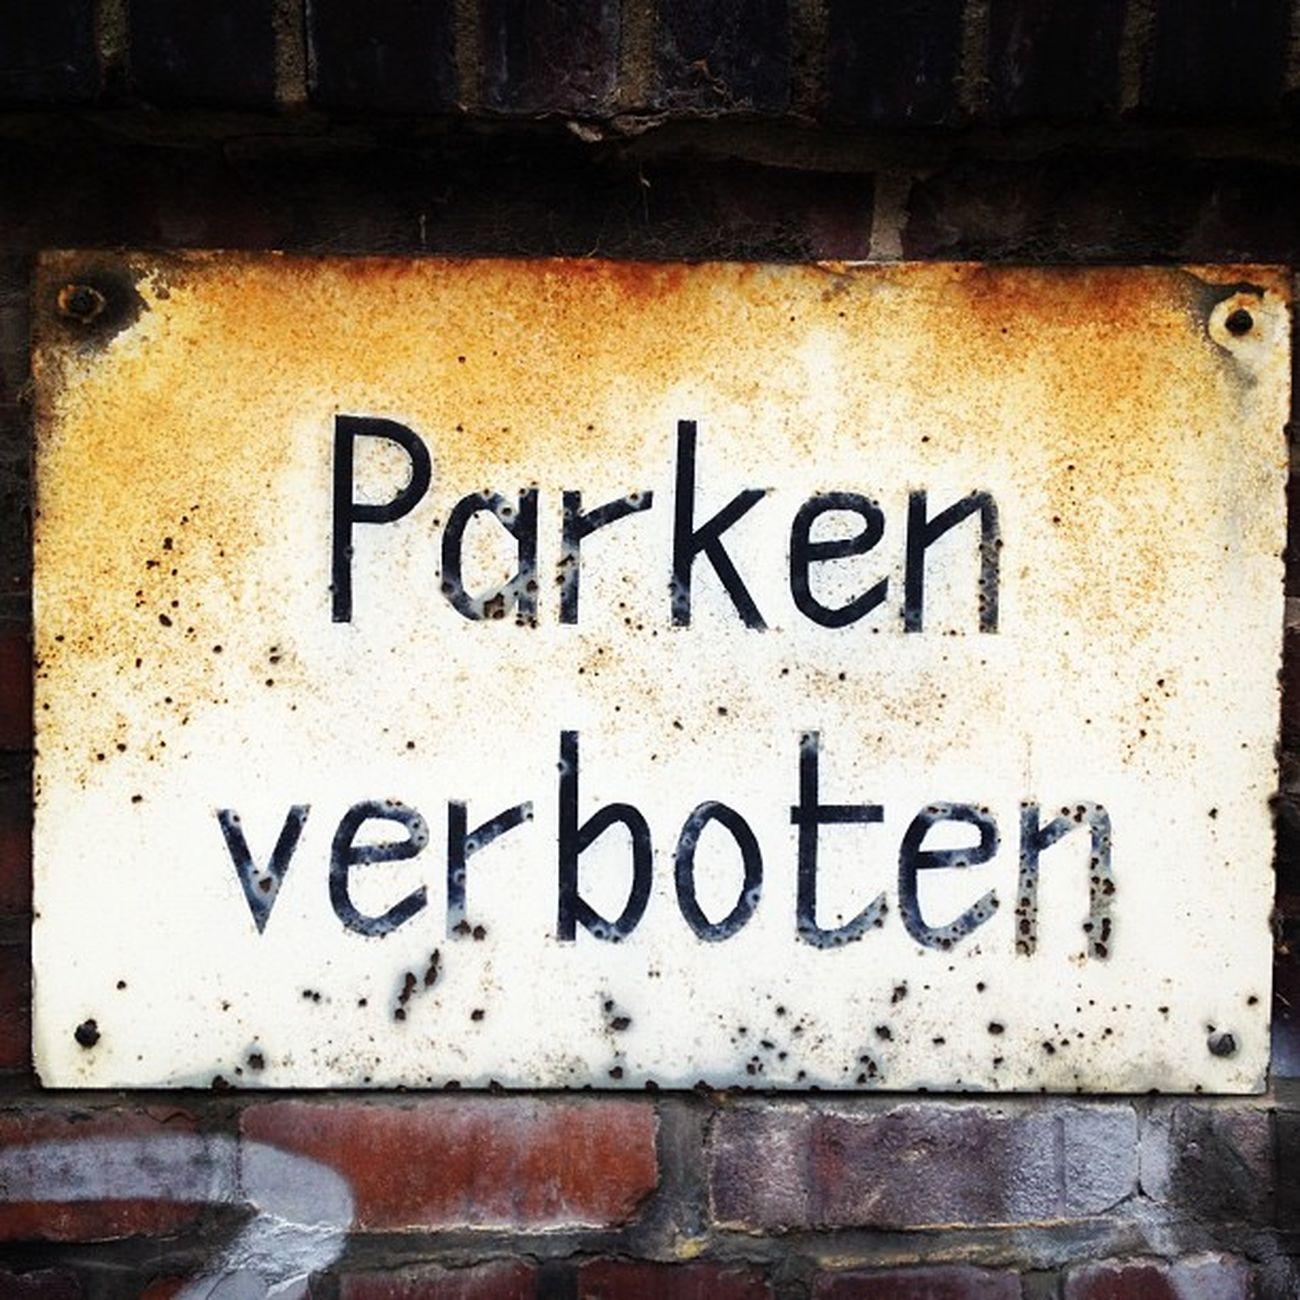 #Parken #Verboten Verboten Parken